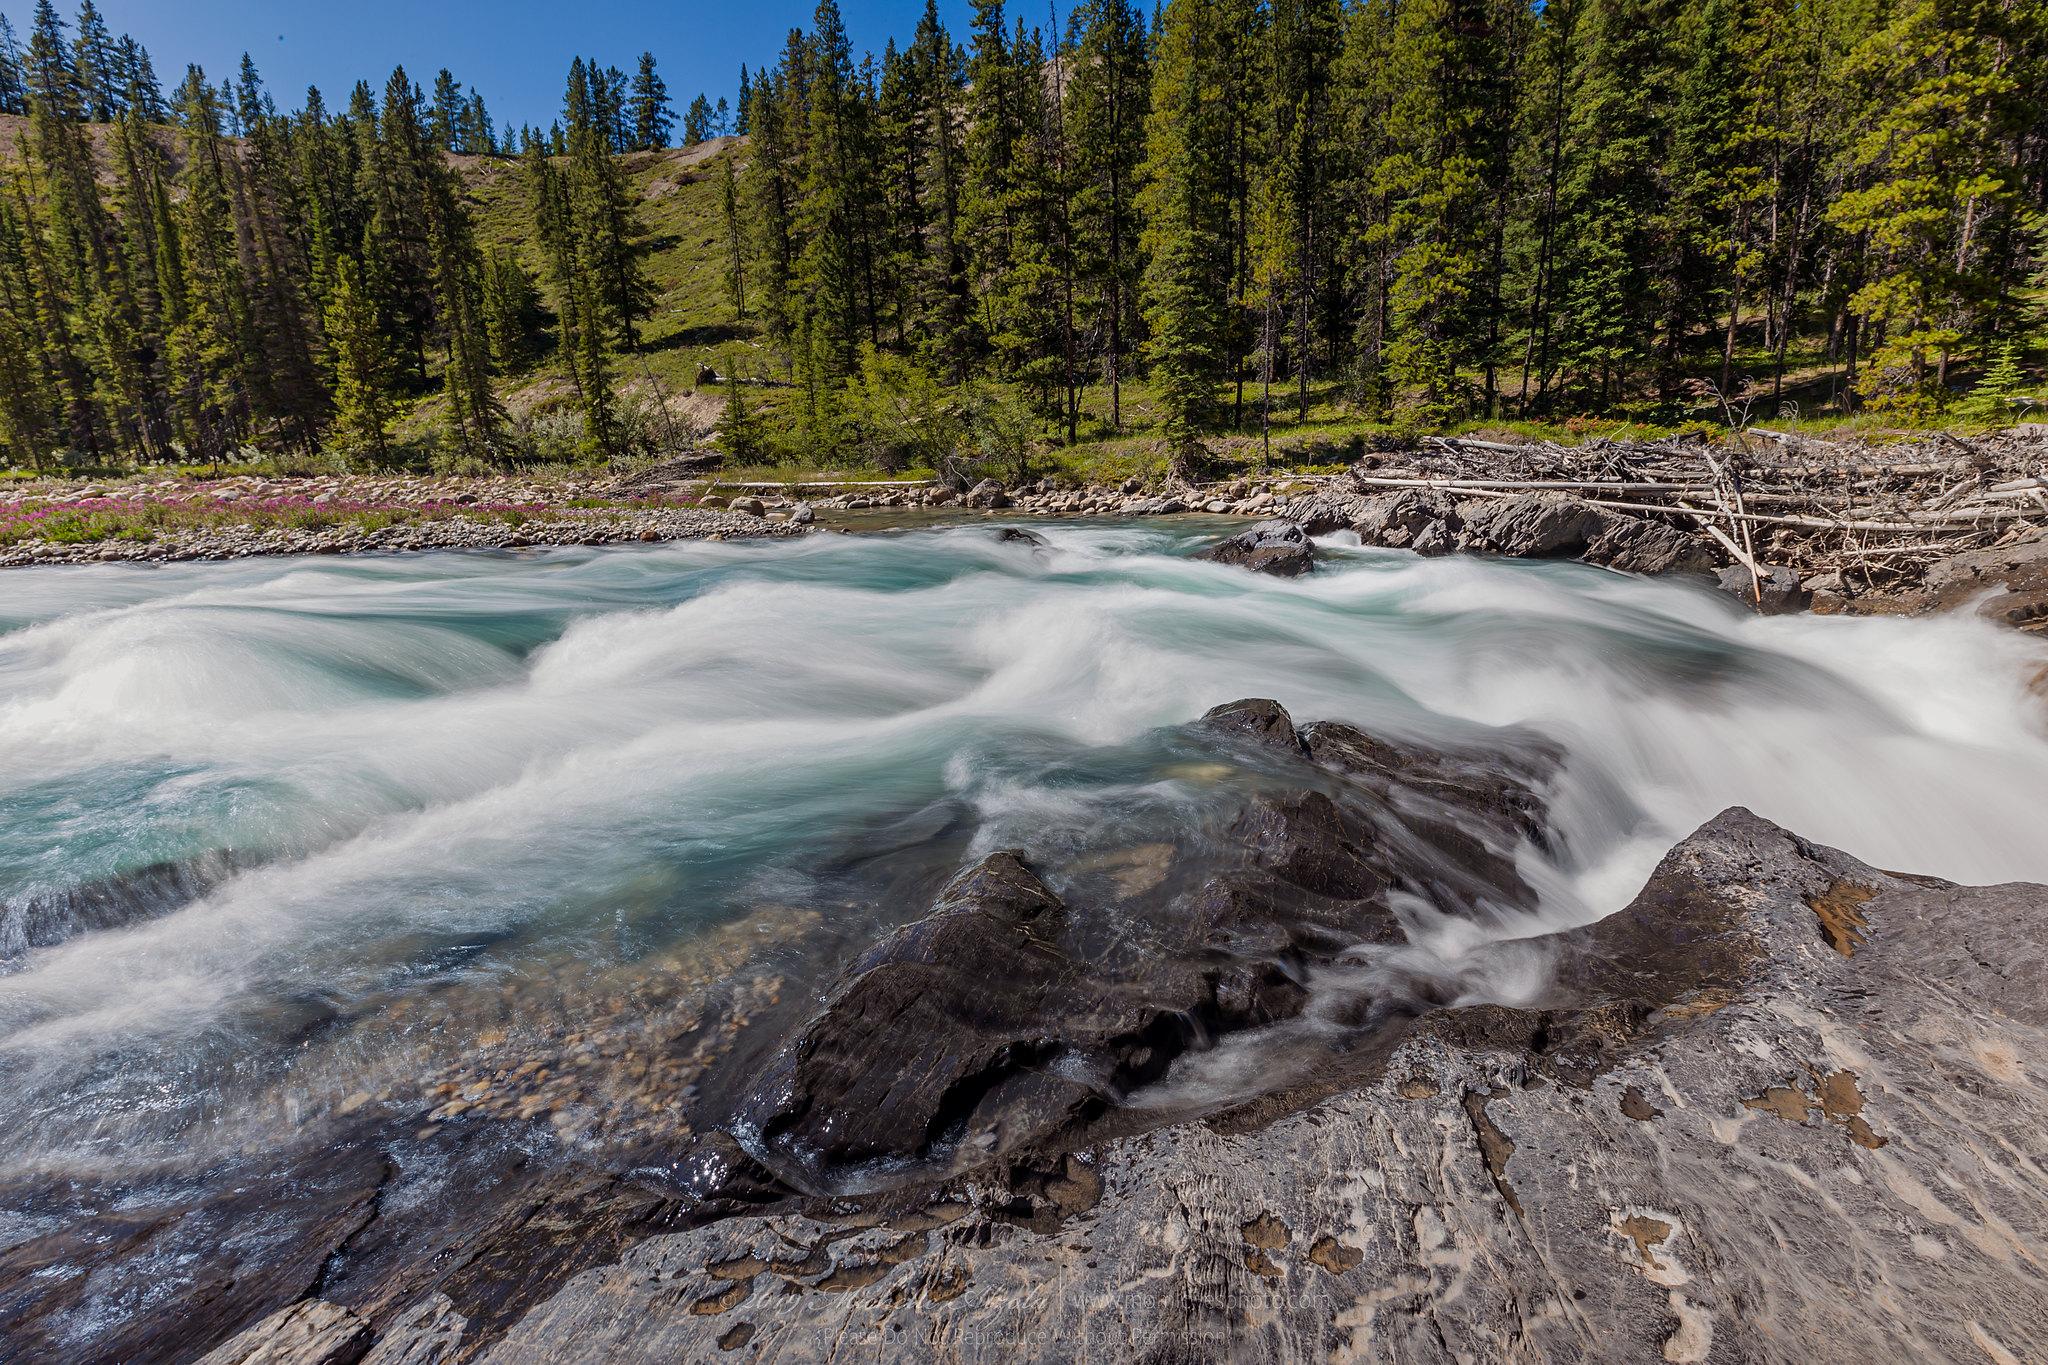 Siffleur Falls